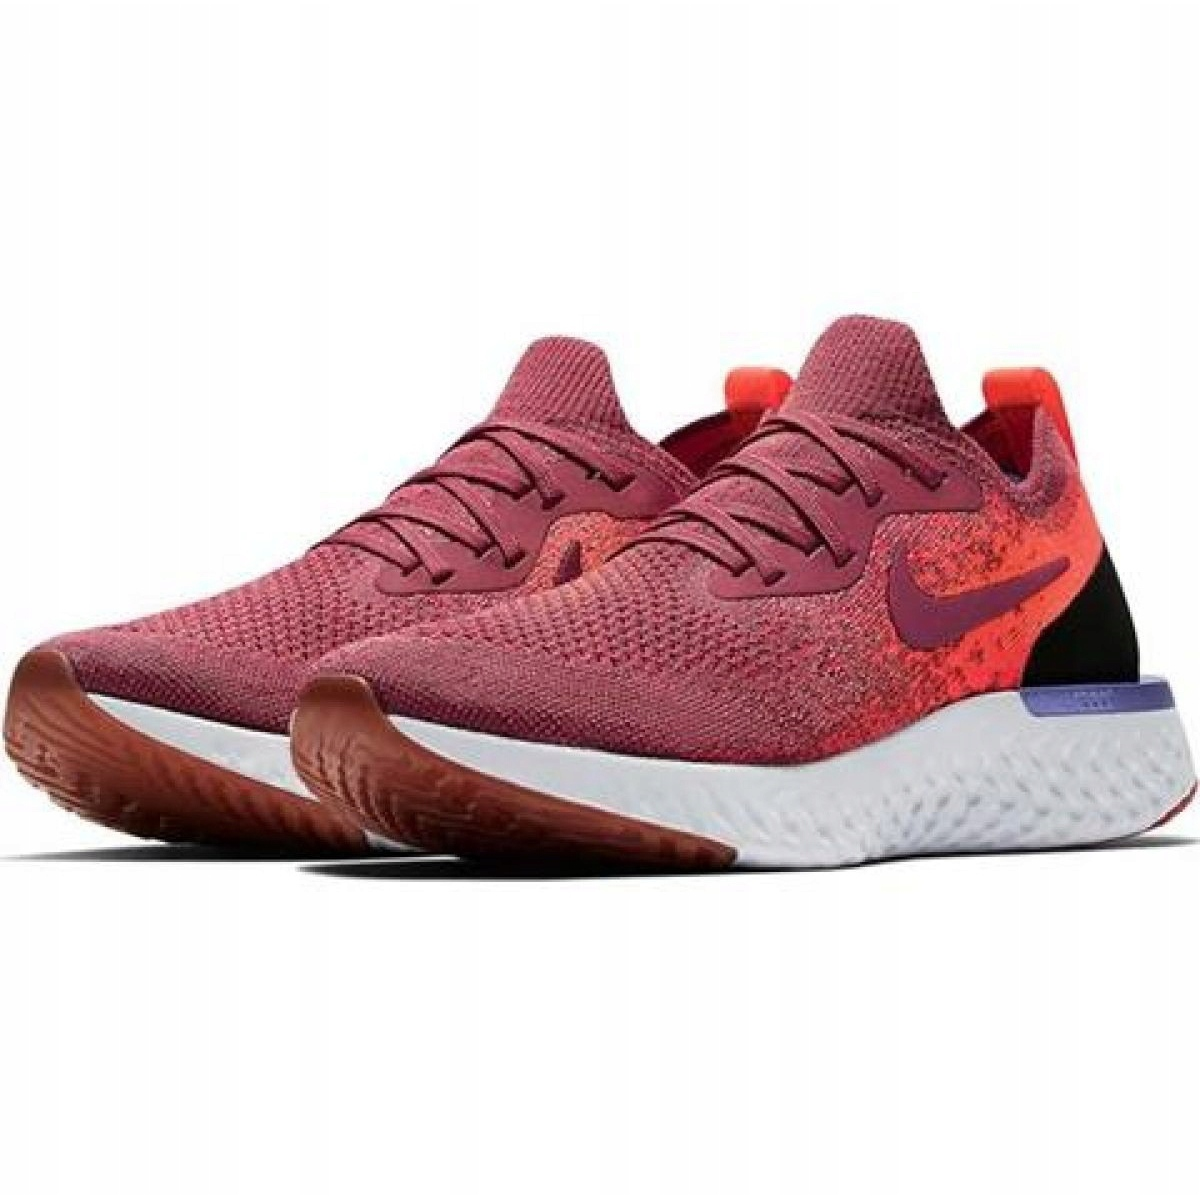 Tênis Nike Epic React Flyknit W AQ0070 601 vermelho